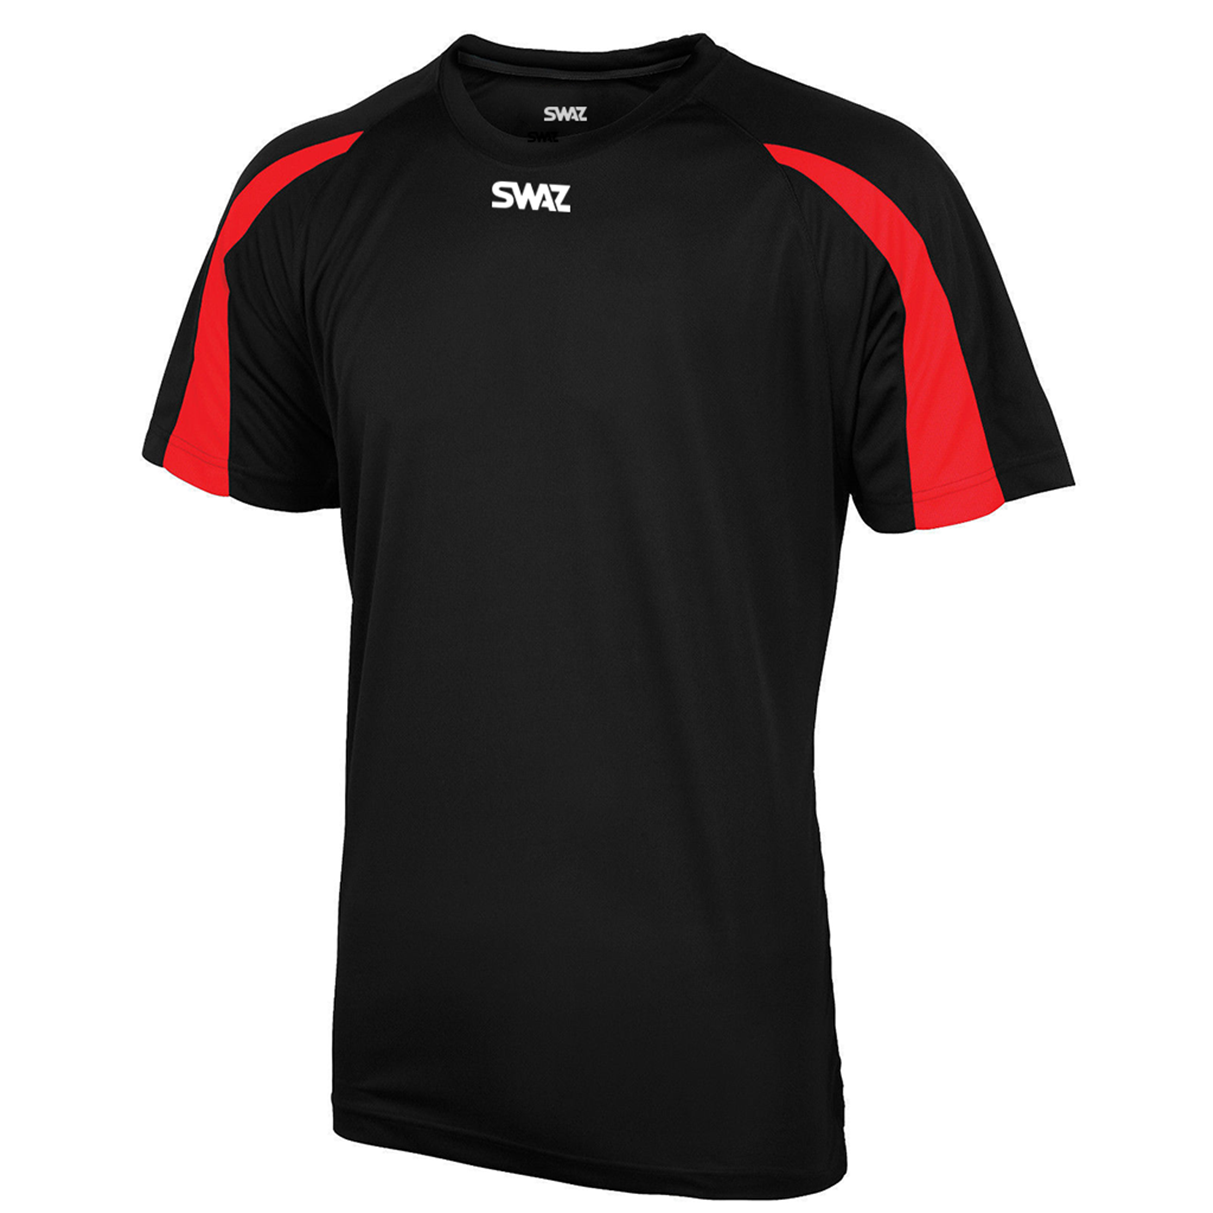 SWAZ Premier Training T-Shirt – Black/Red